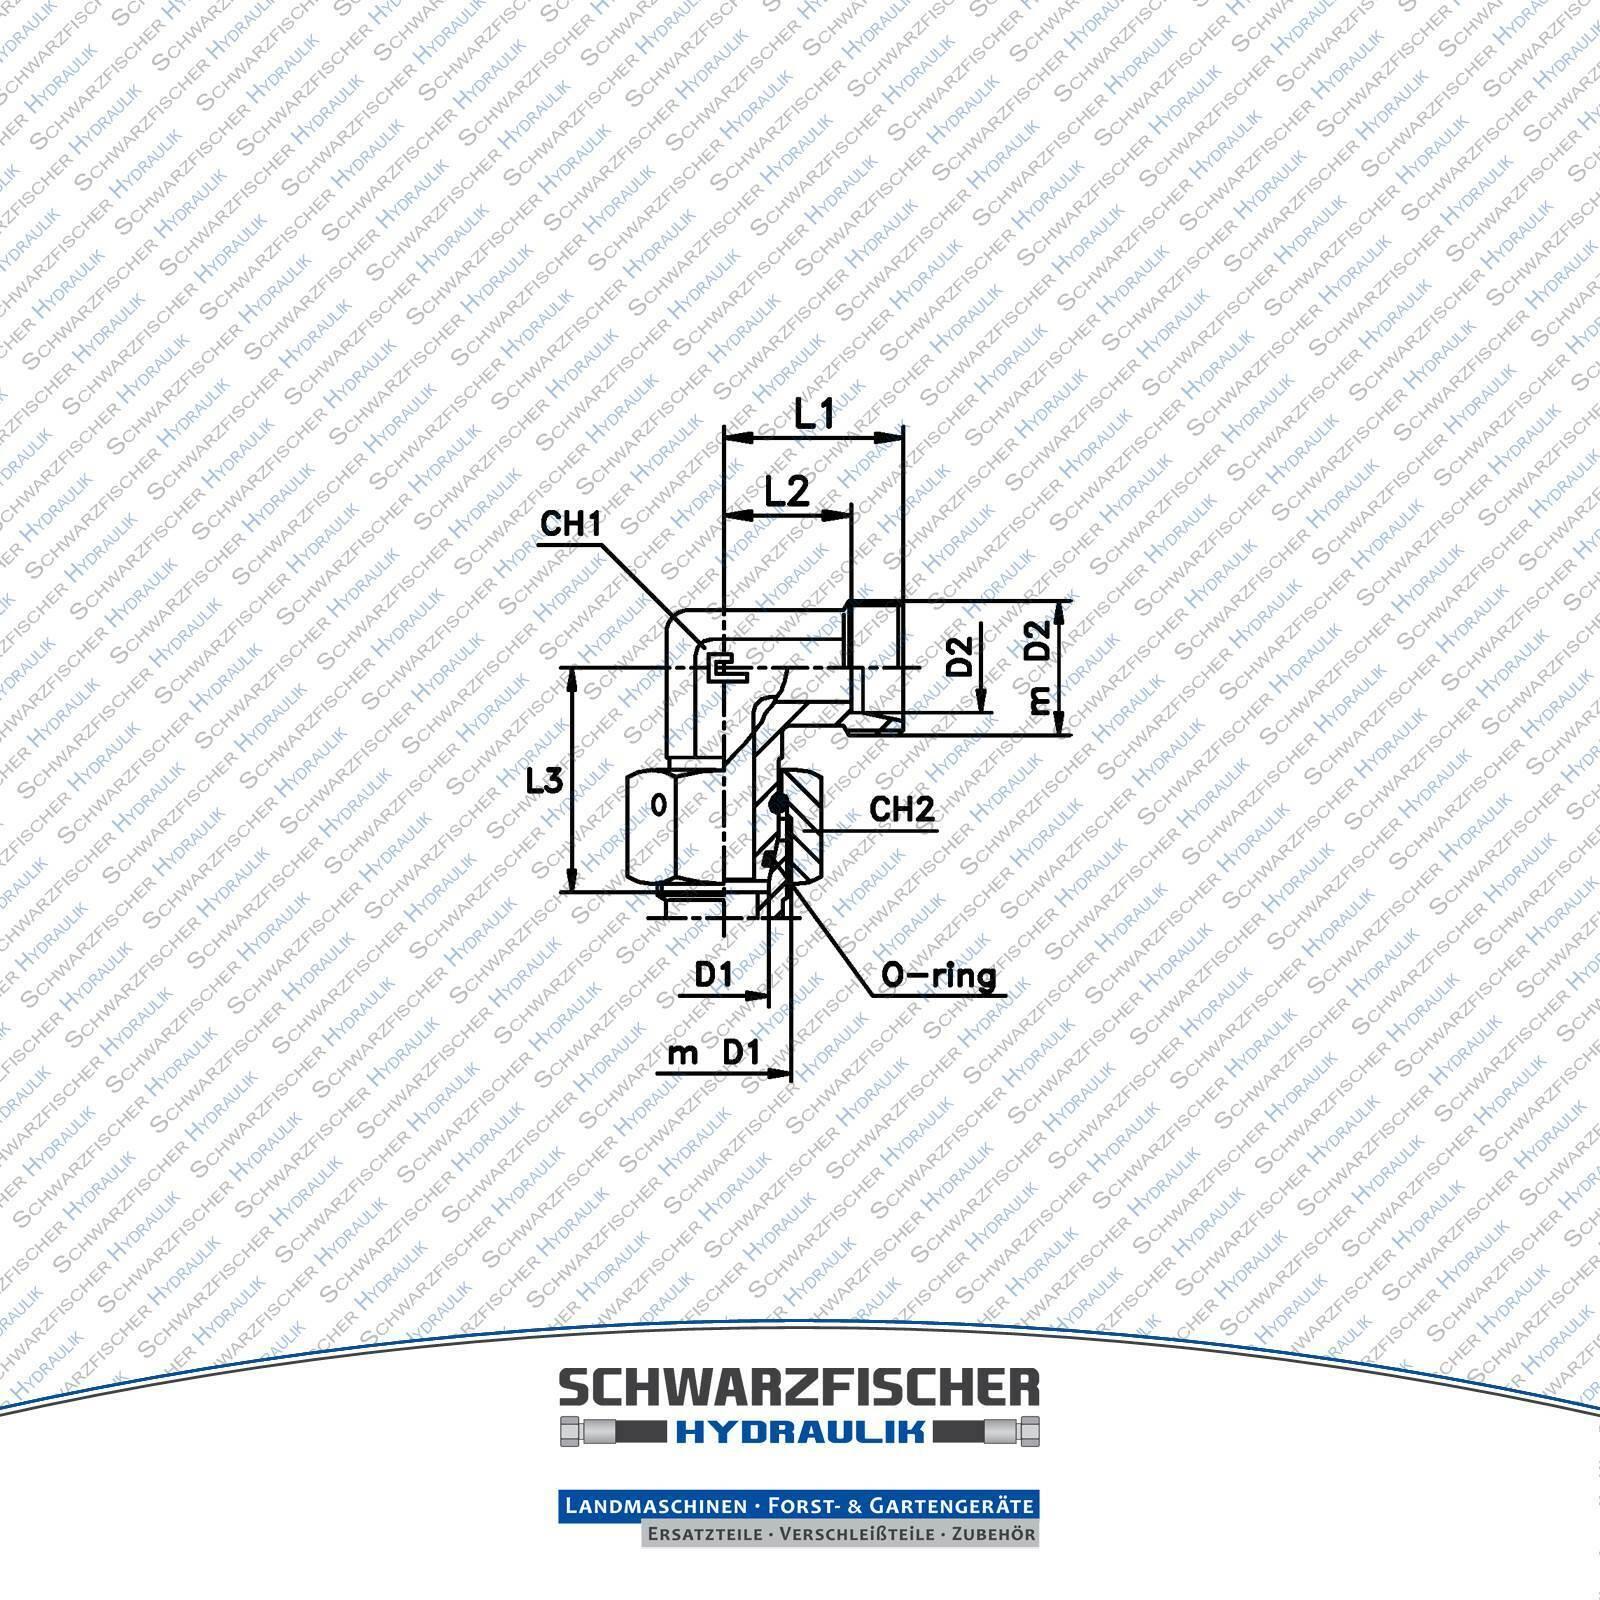 Hydraulik 8-L//6-S ED Winkel M14 Rohr-Verschraub-Adapter SW17 L-Verbindungsstück